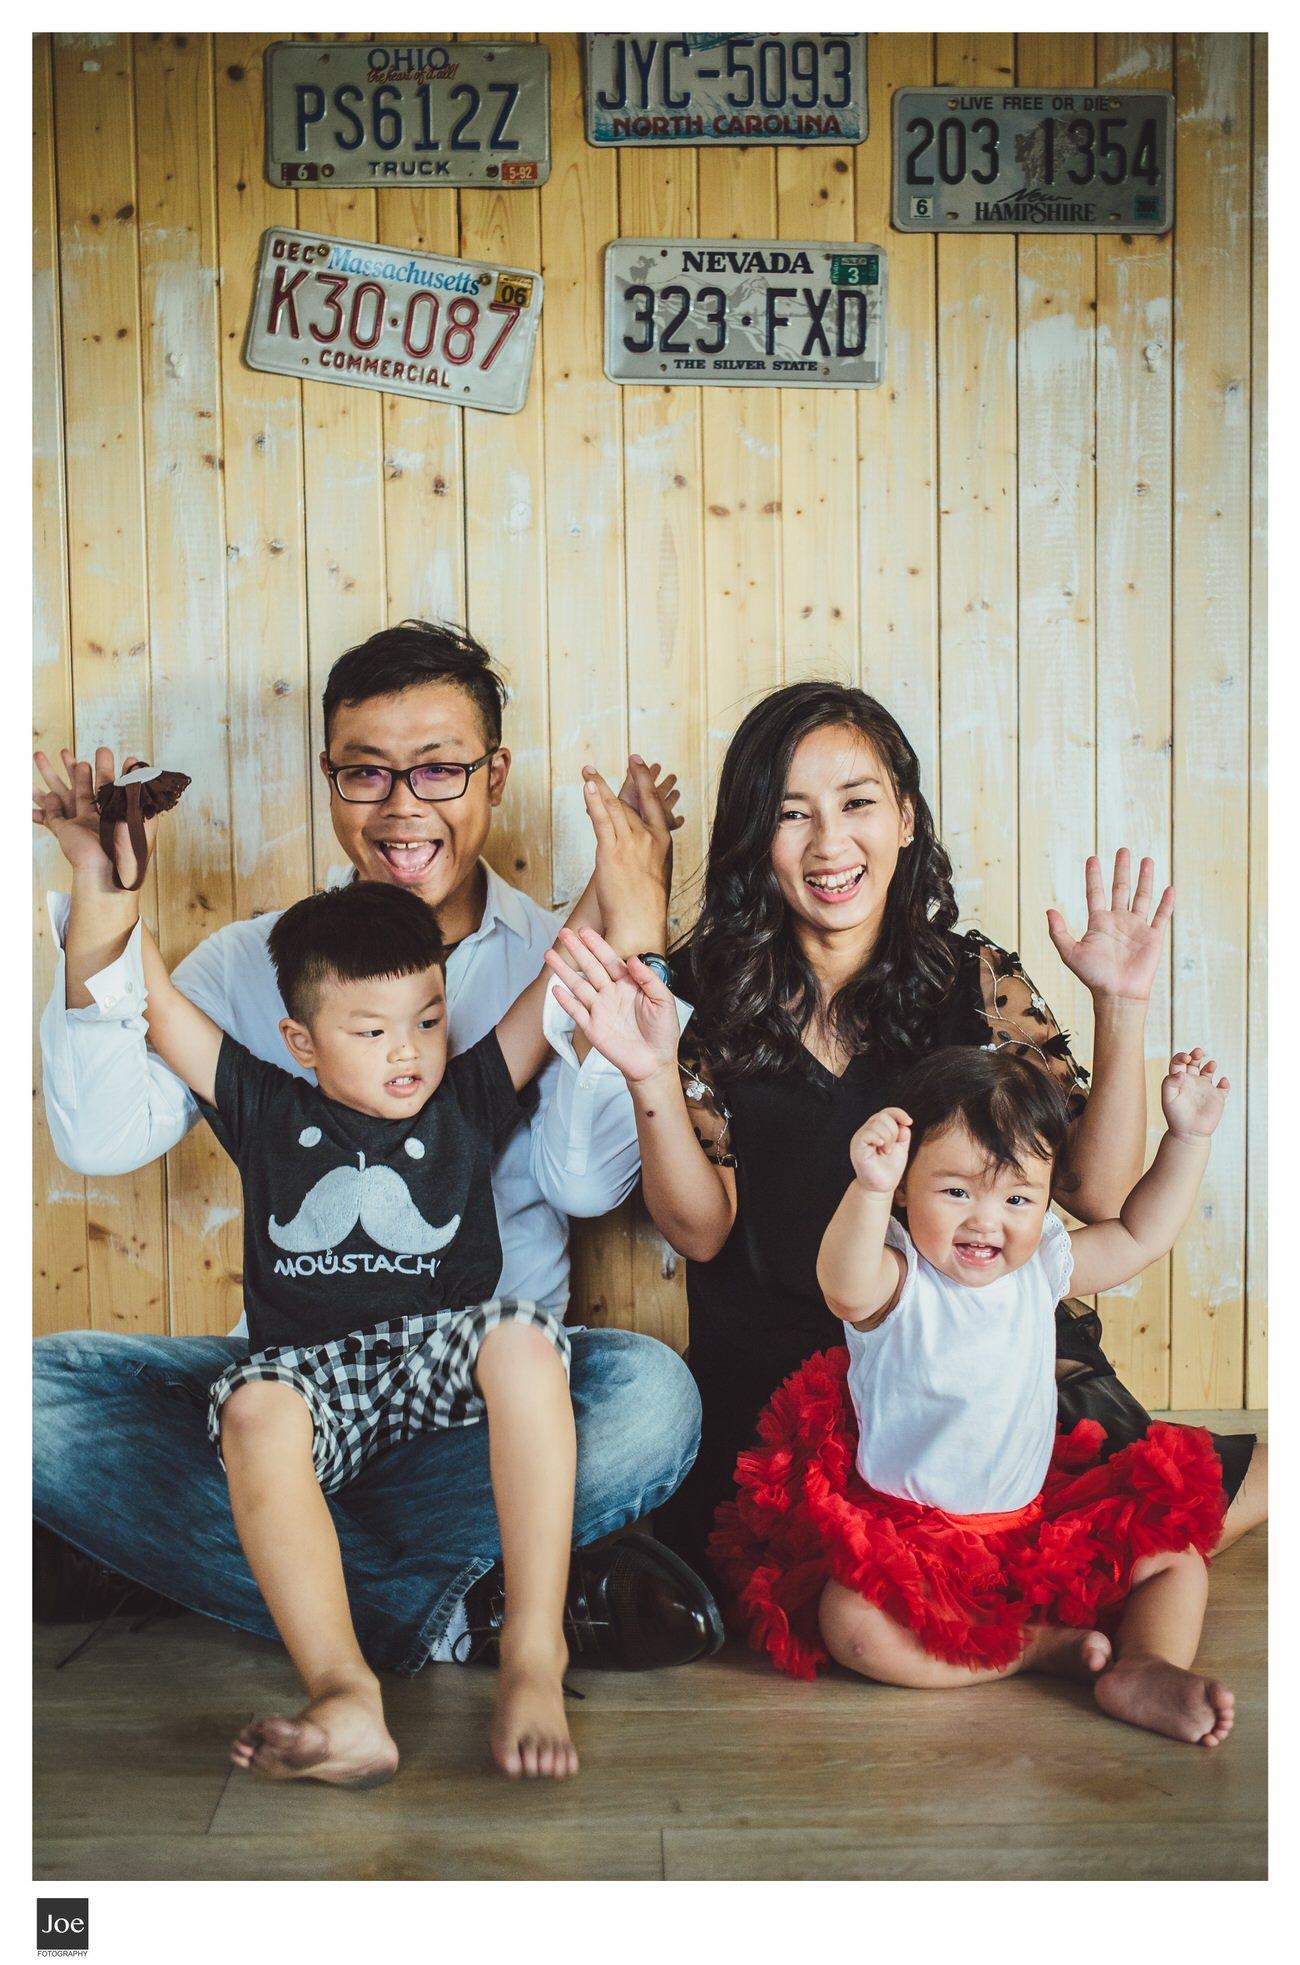 joe-fotography-family-photo-pepper-salt-bowtie-032.jpg